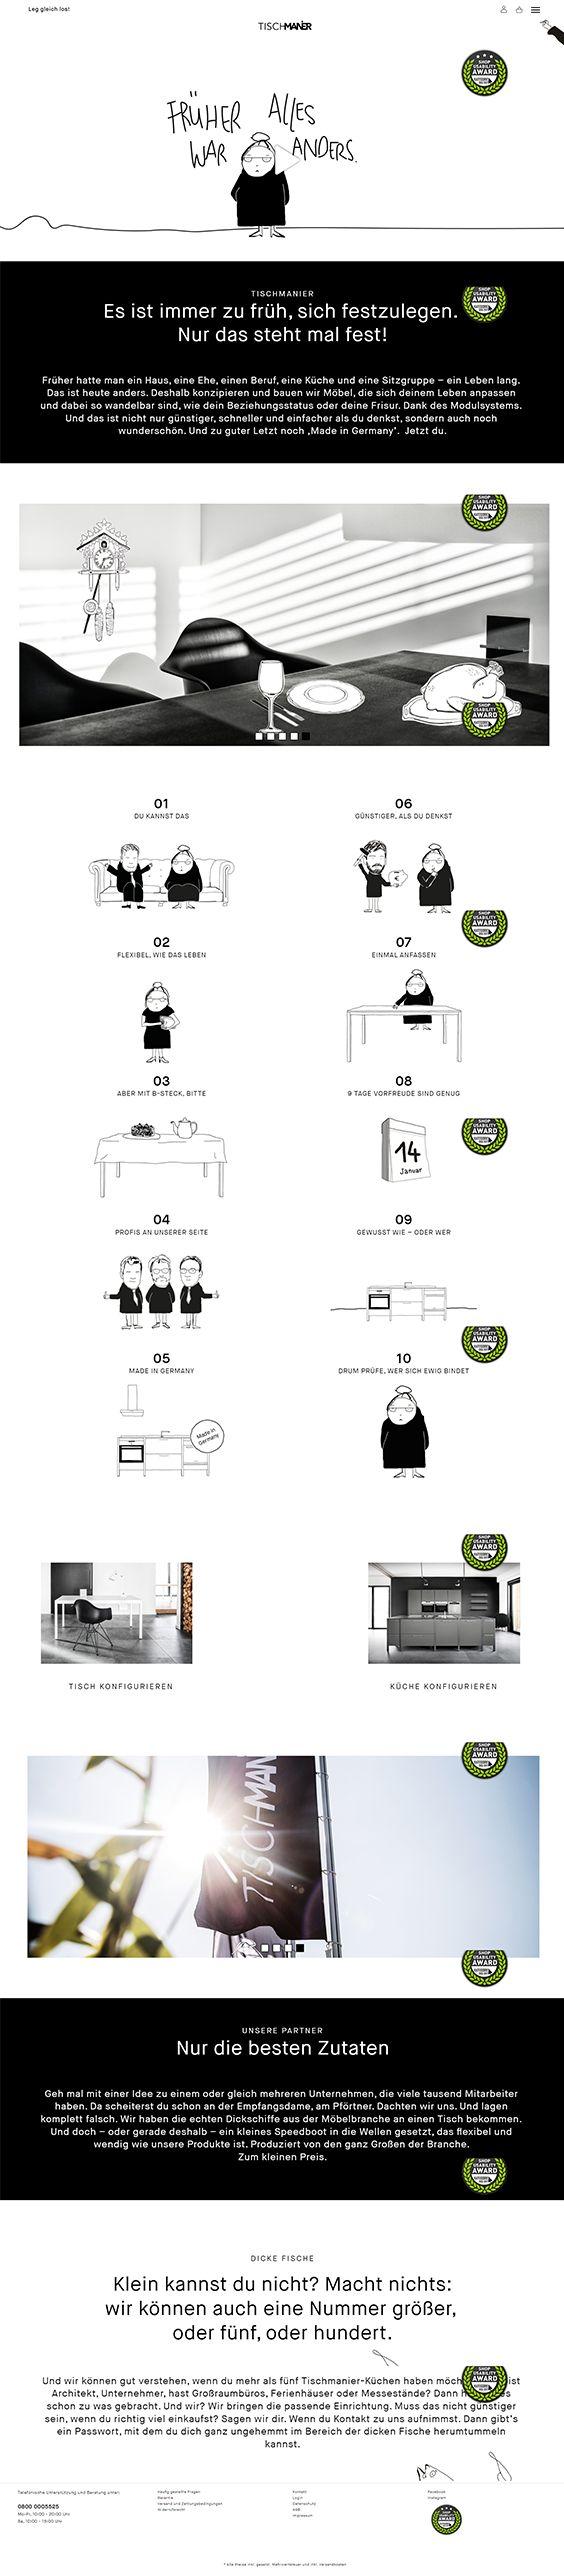 Shopware Design, Shopware Theme, Shopware Shop, eCommerce, eCommerce Software, eCommerce platform, Onlineshop, Interior Design, Furniture, Indoor Furniture, Design Furniture, Shelf, Kitchen configurator